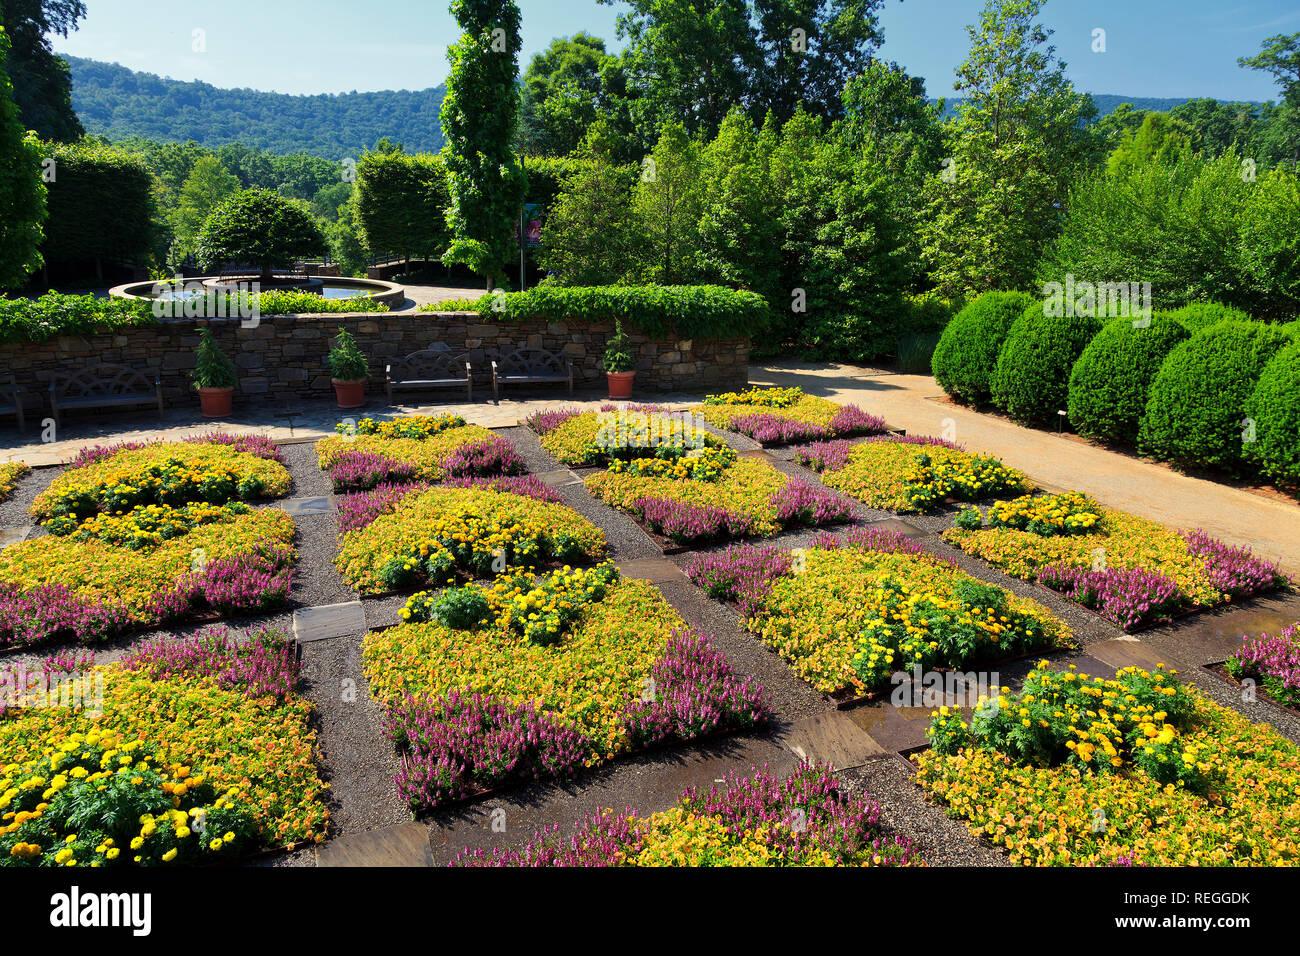 Patterned Quilt Garden in Asheville North Carolina - Stock Image